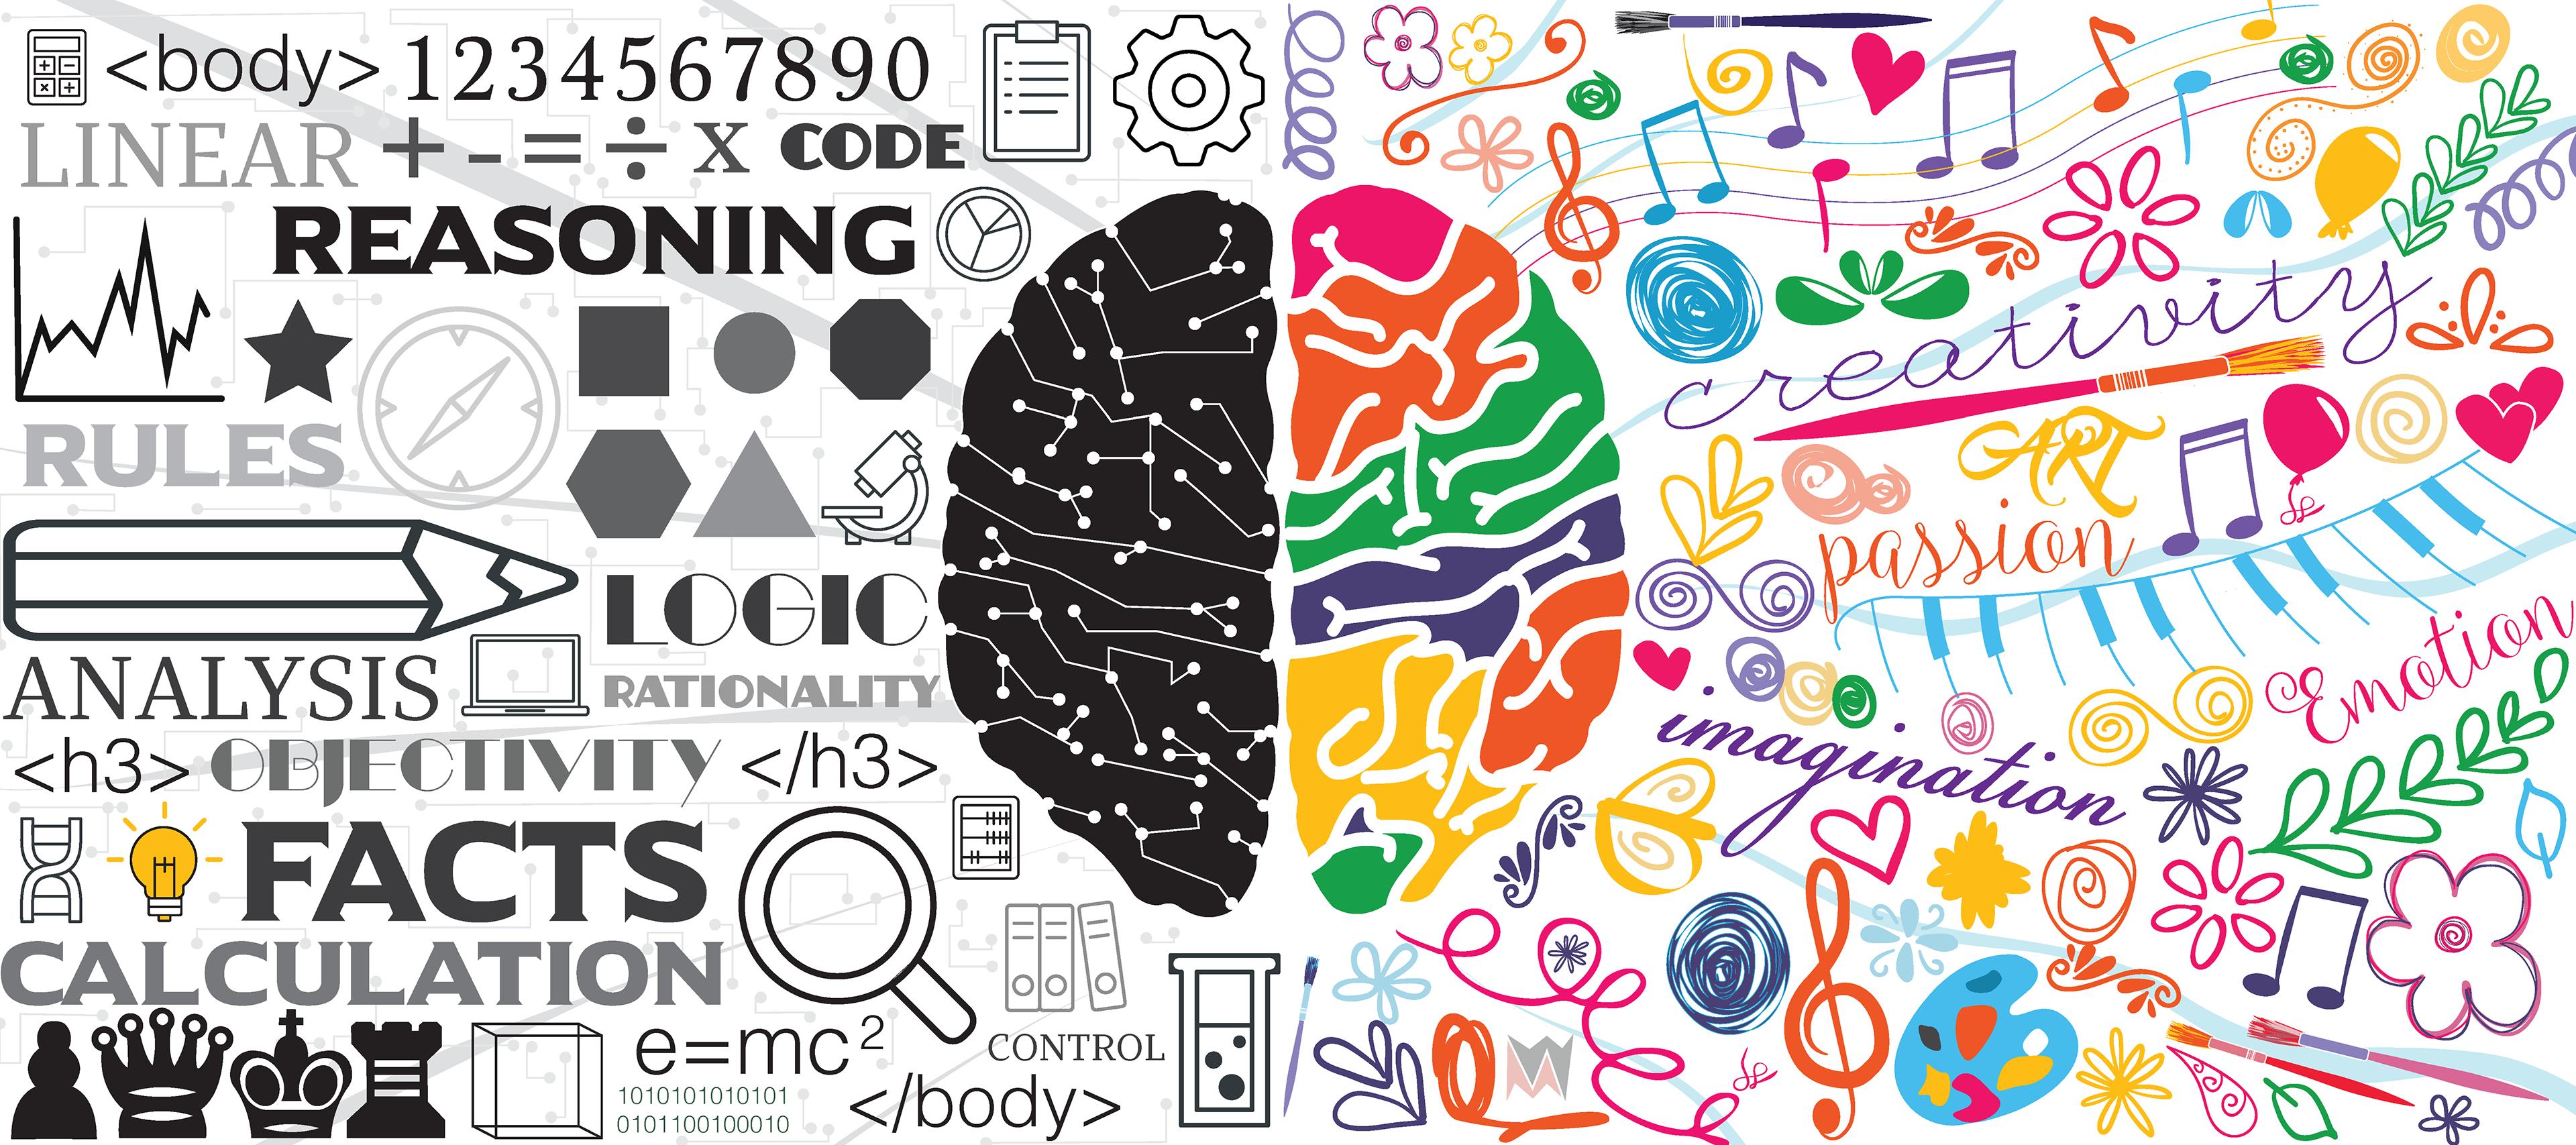 EQ หนังสือ Emotional Intelligence ความถนัดทางอารมณ์